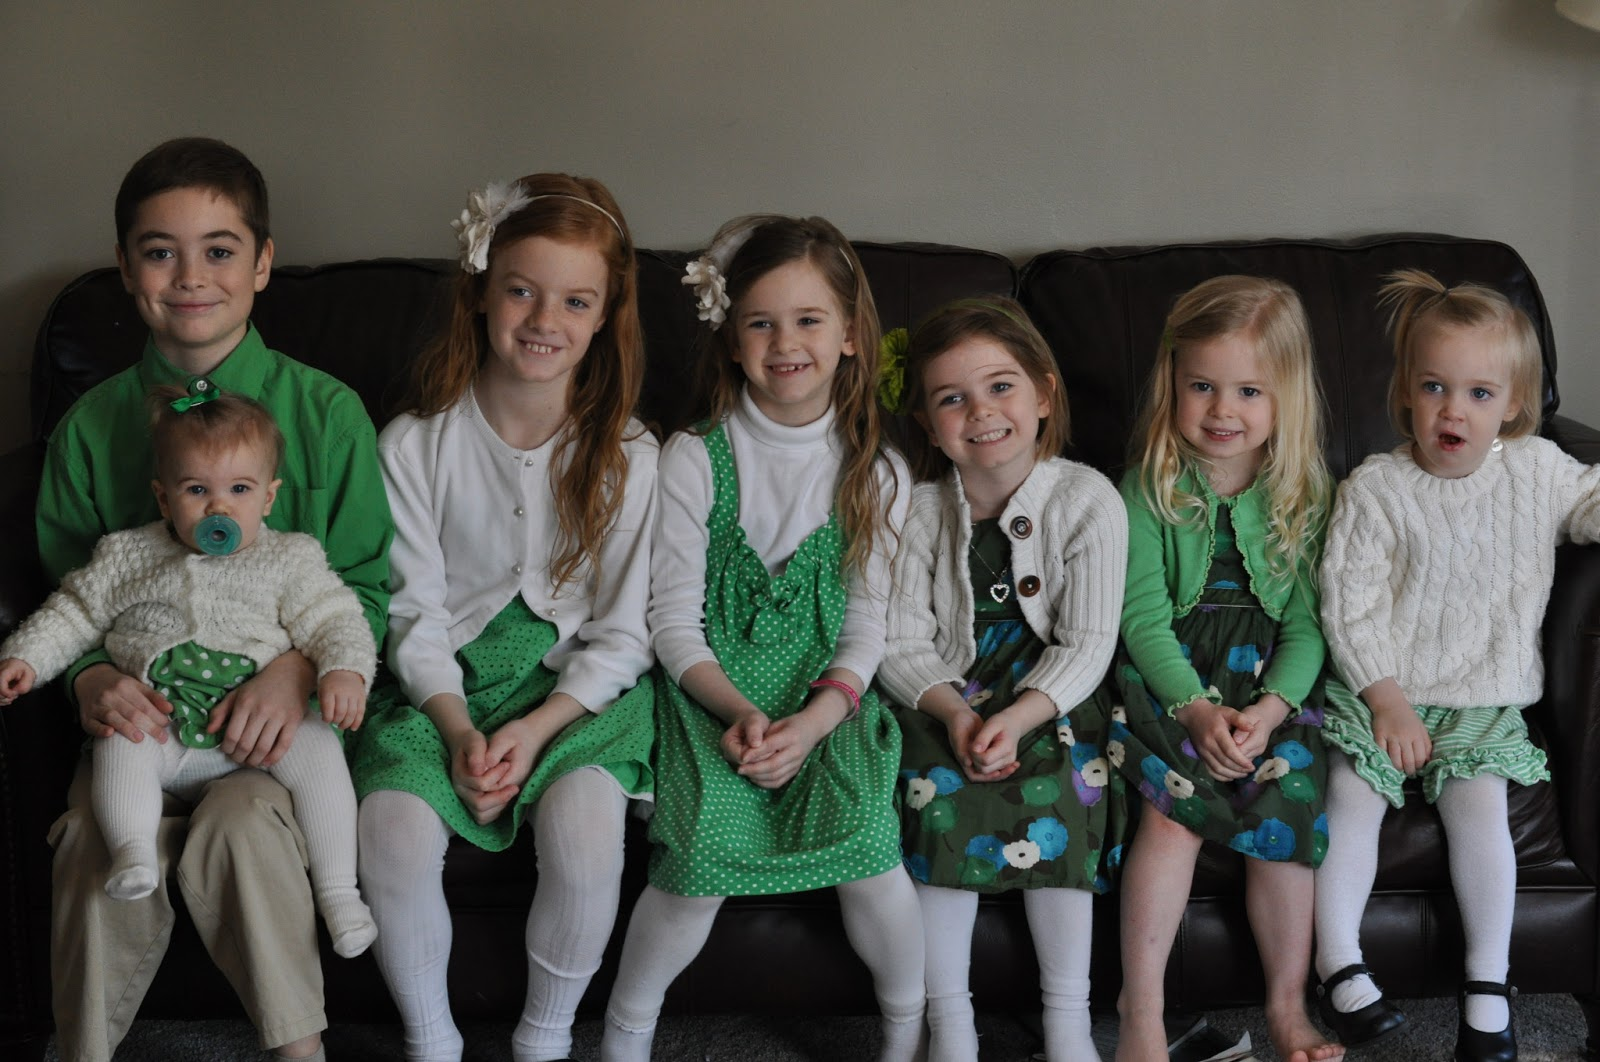 irish st families patrick lots child today known having john english hair countries patricks historically well